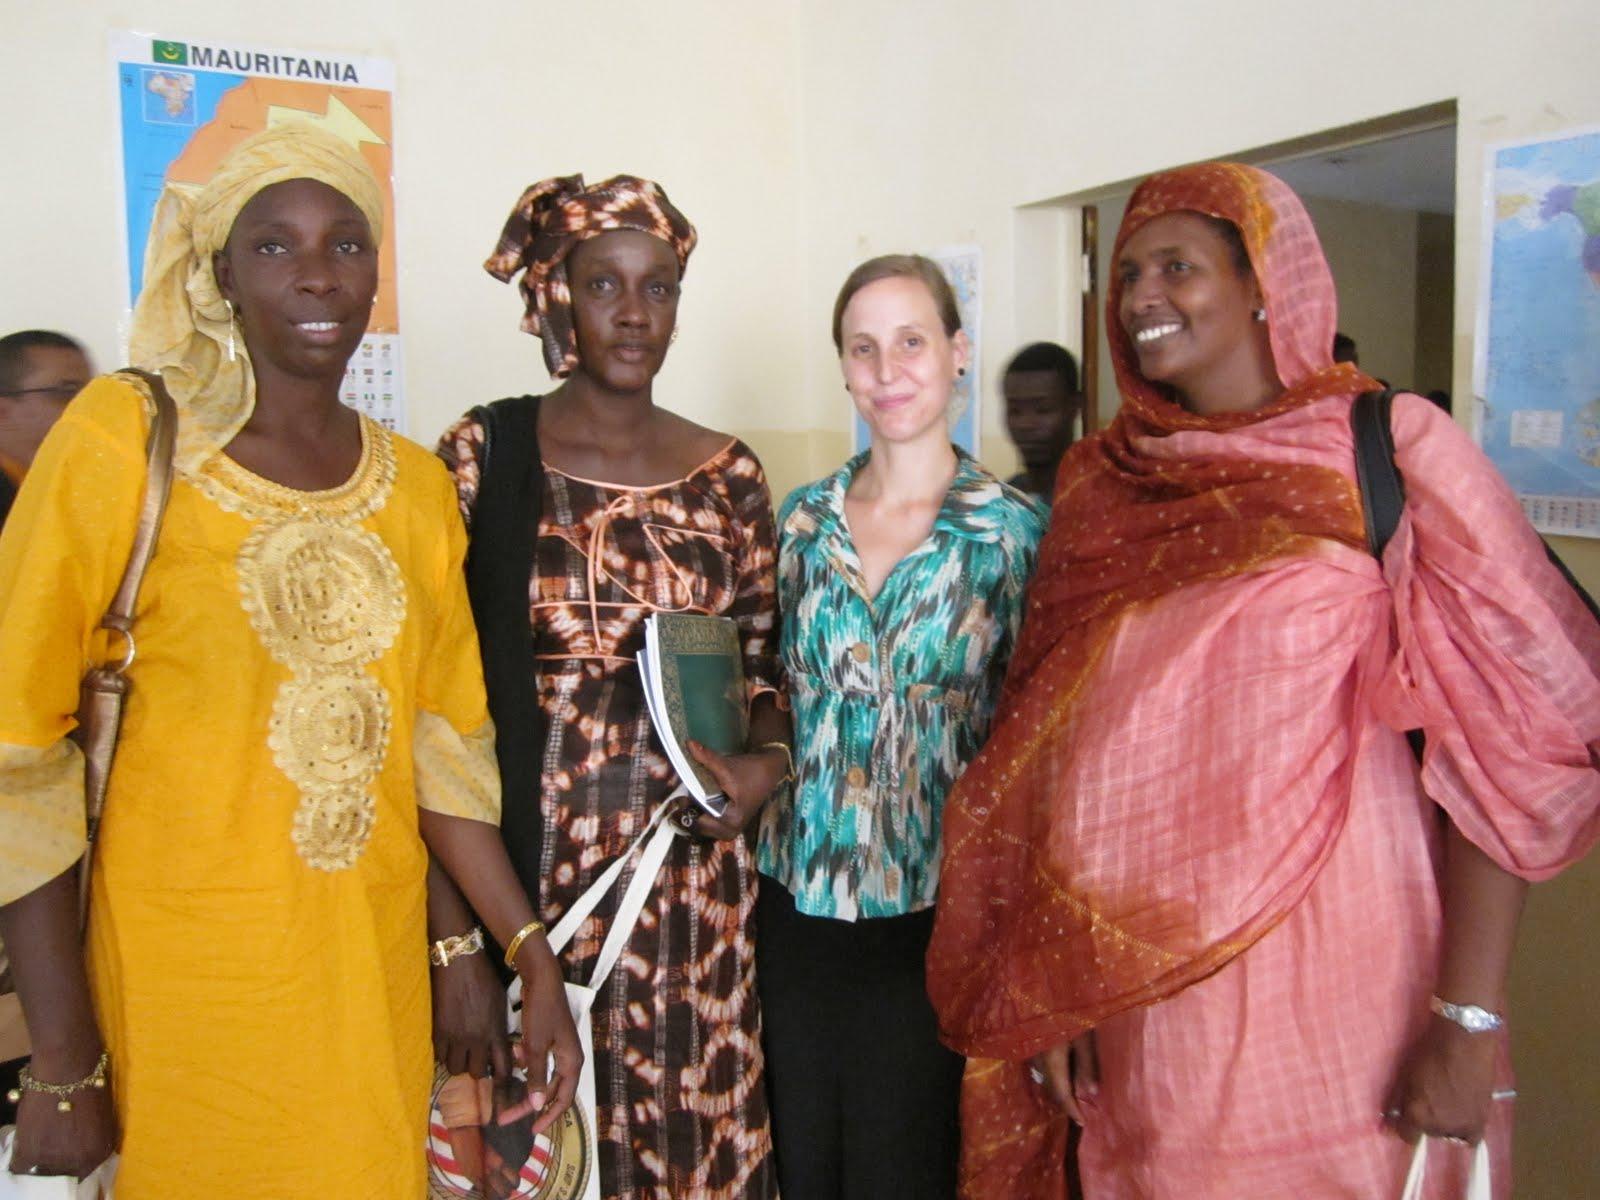 madame ou mademoiselle celebrating mauritania 39 s english teachers. Black Bedroom Furniture Sets. Home Design Ideas